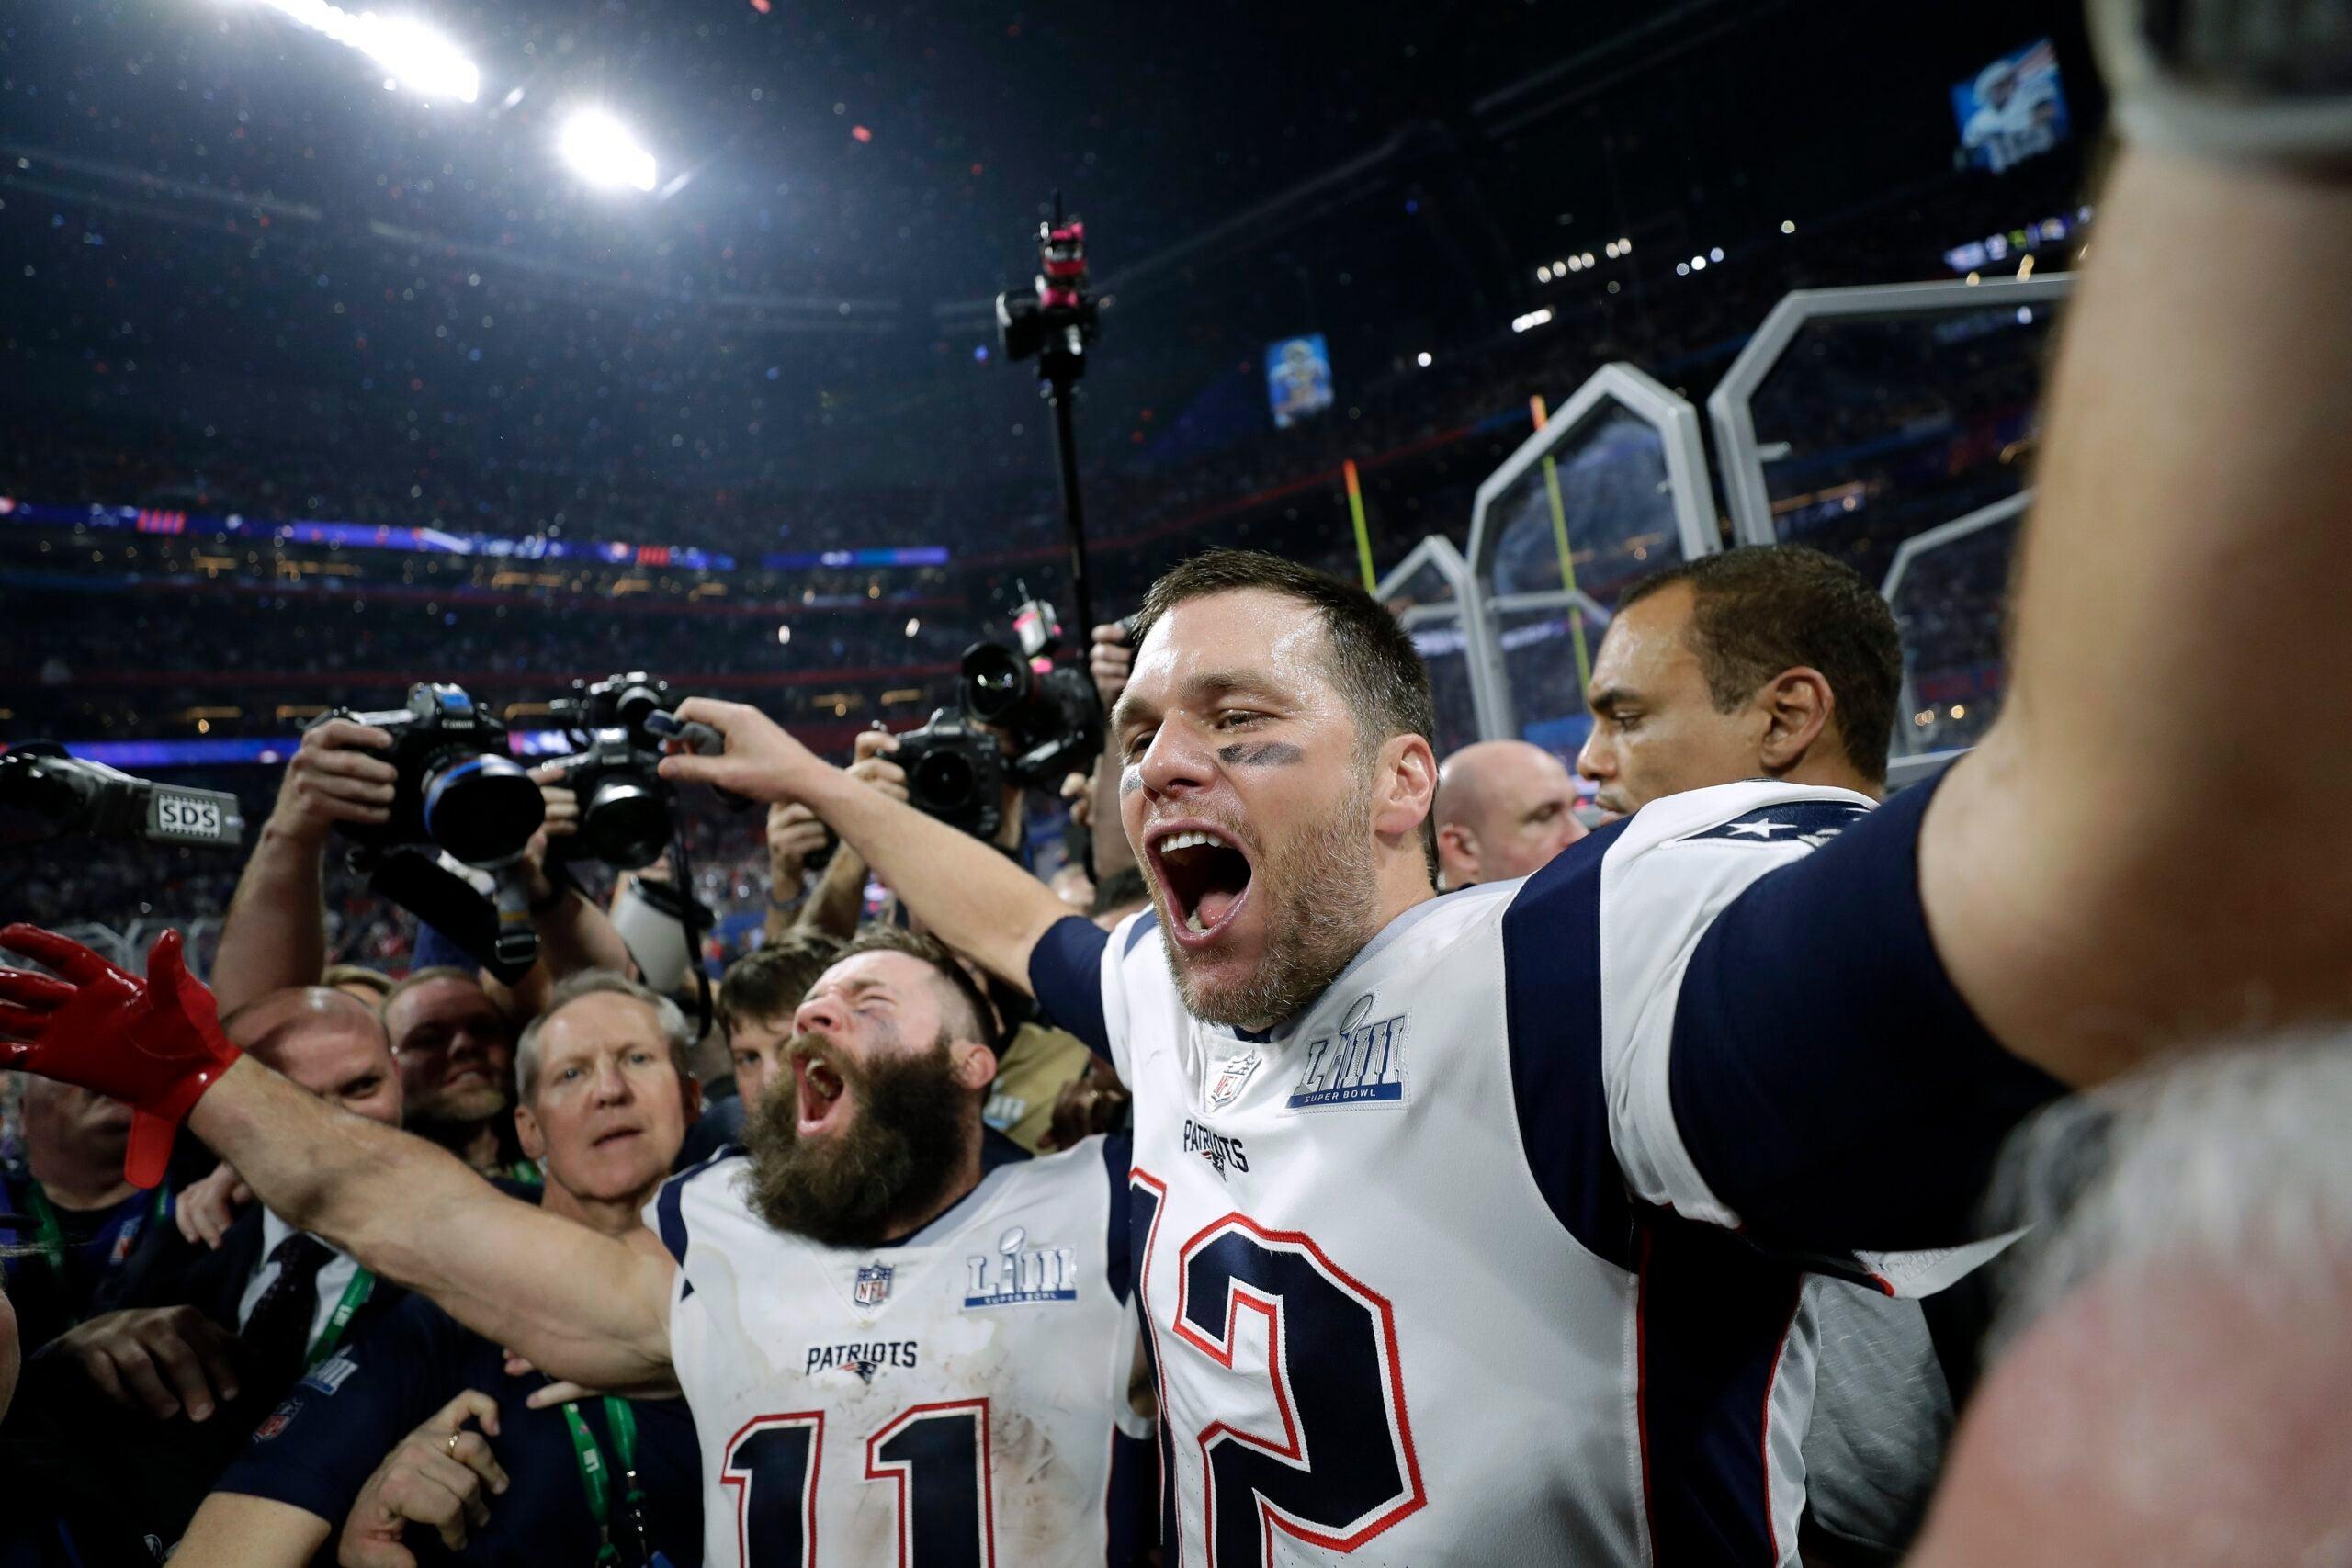 Julian Edelman and Tom Brady celebrate winning Super Bowl LIII.